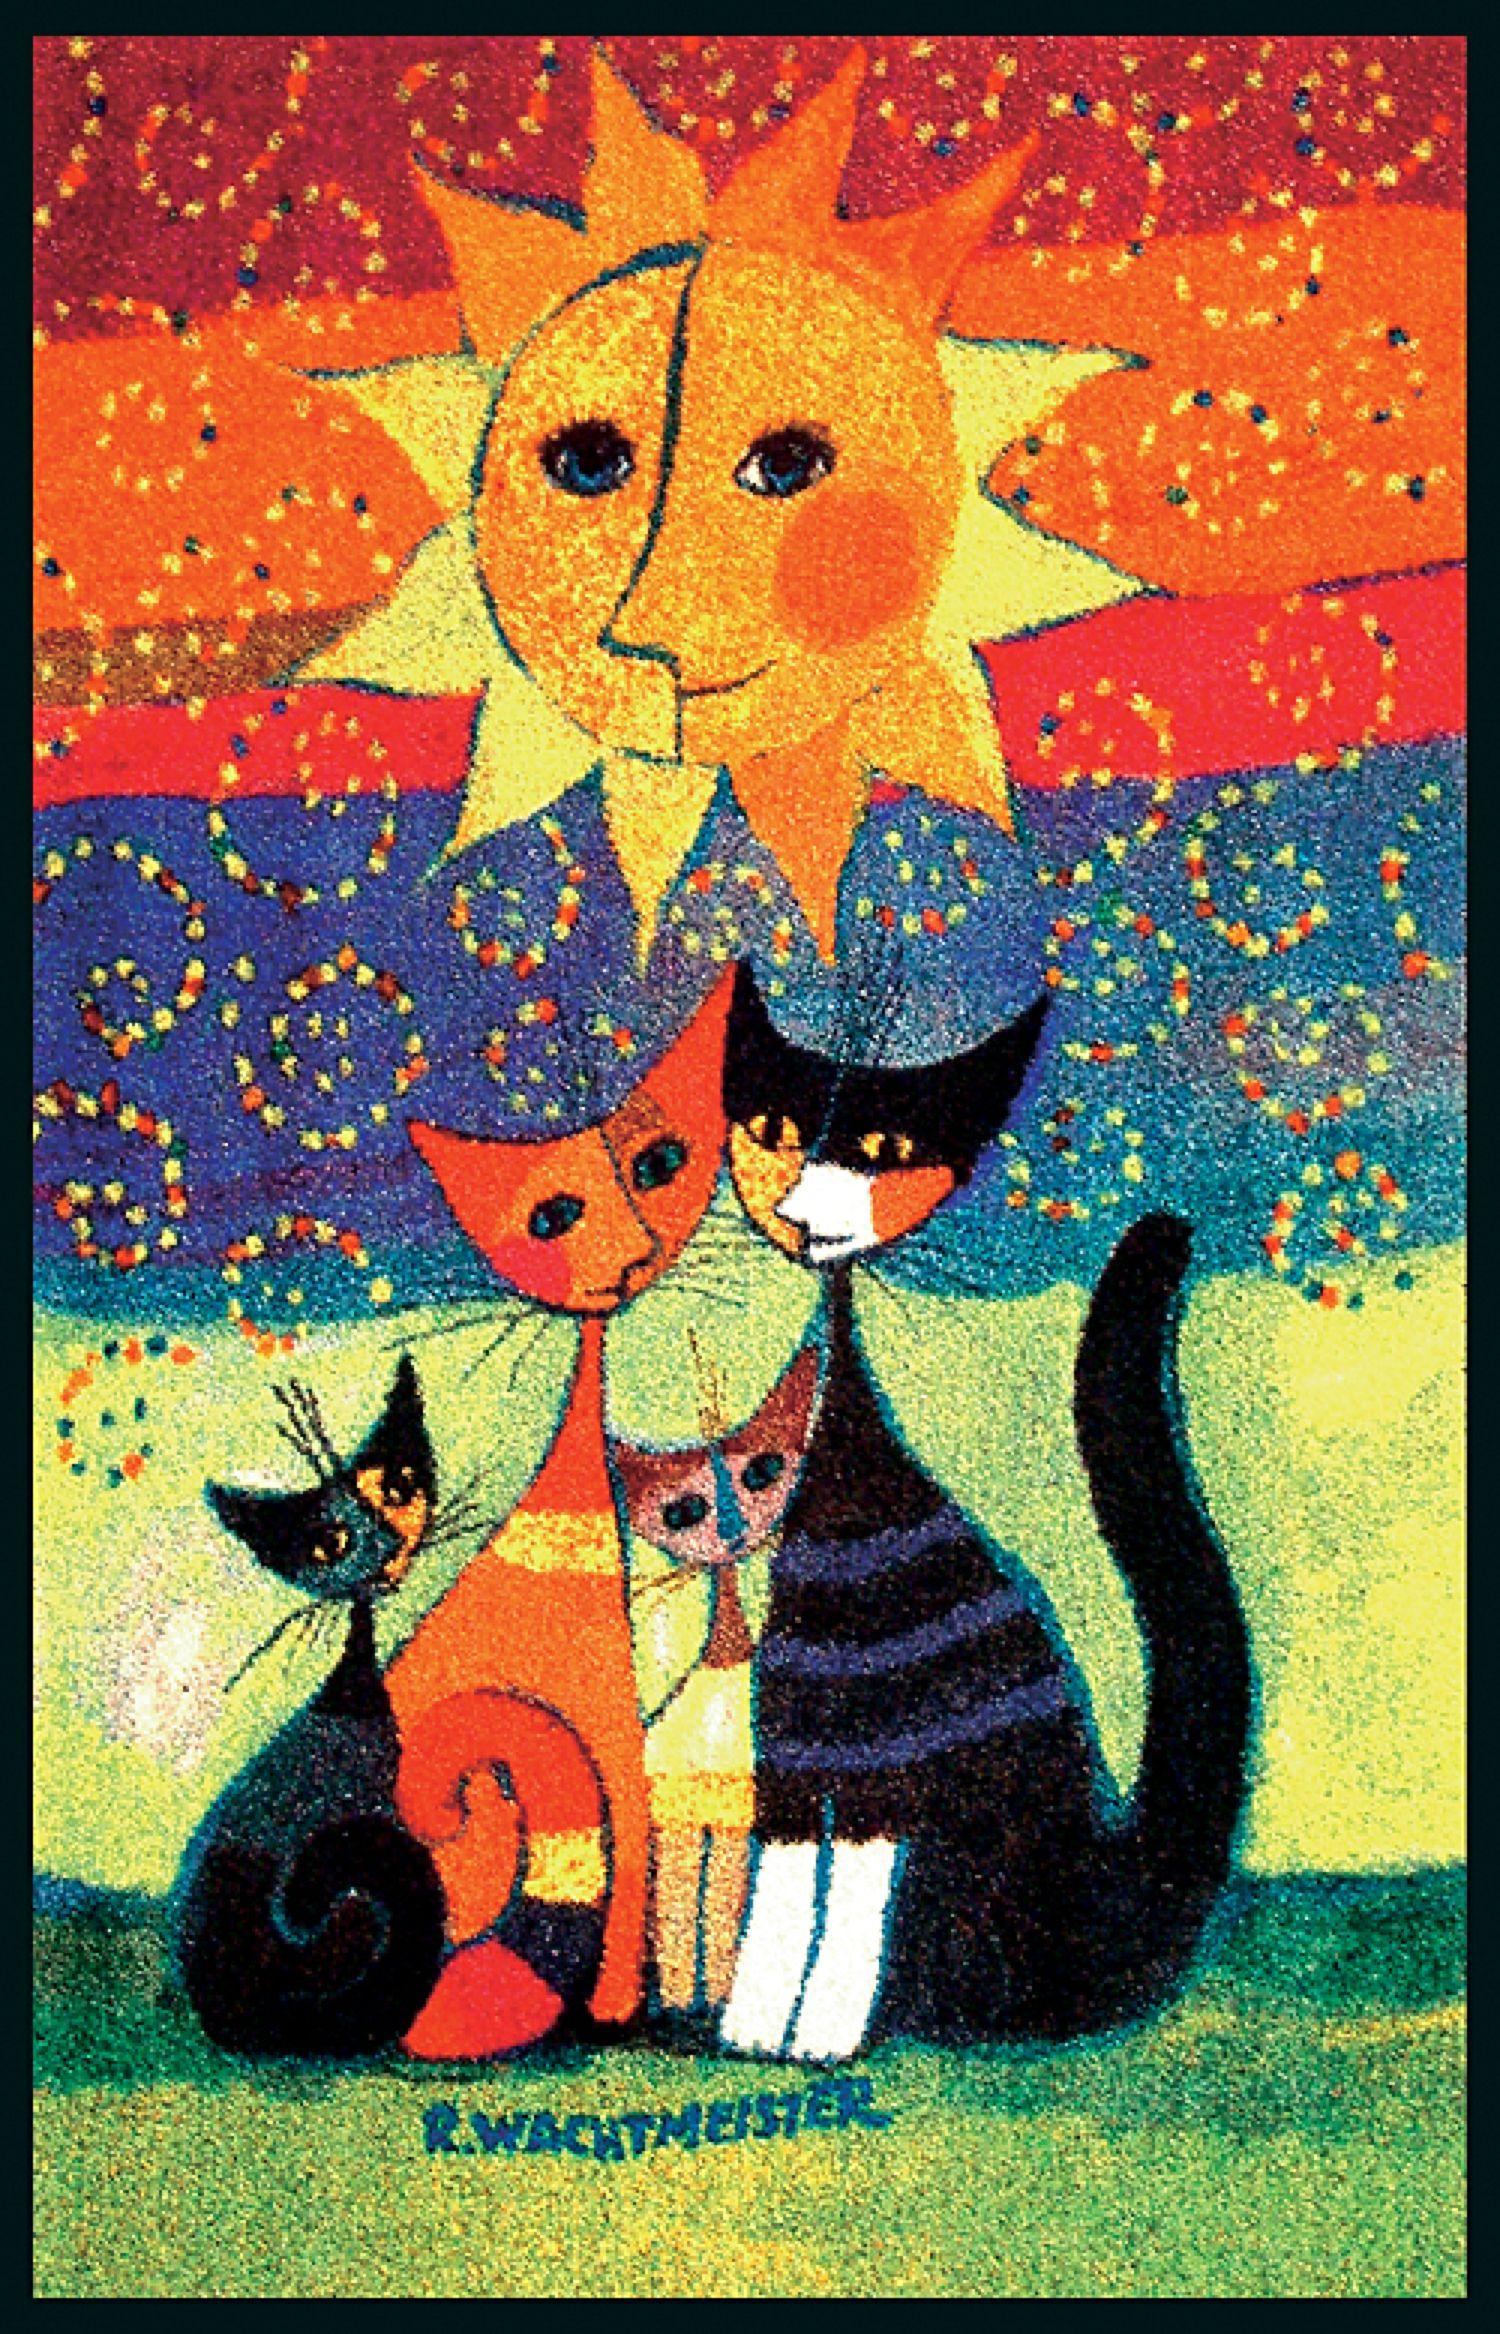 fussmatte katzen momenti rosina wachtmeister art katzen meow pinterest more cat. Black Bedroom Furniture Sets. Home Design Ideas